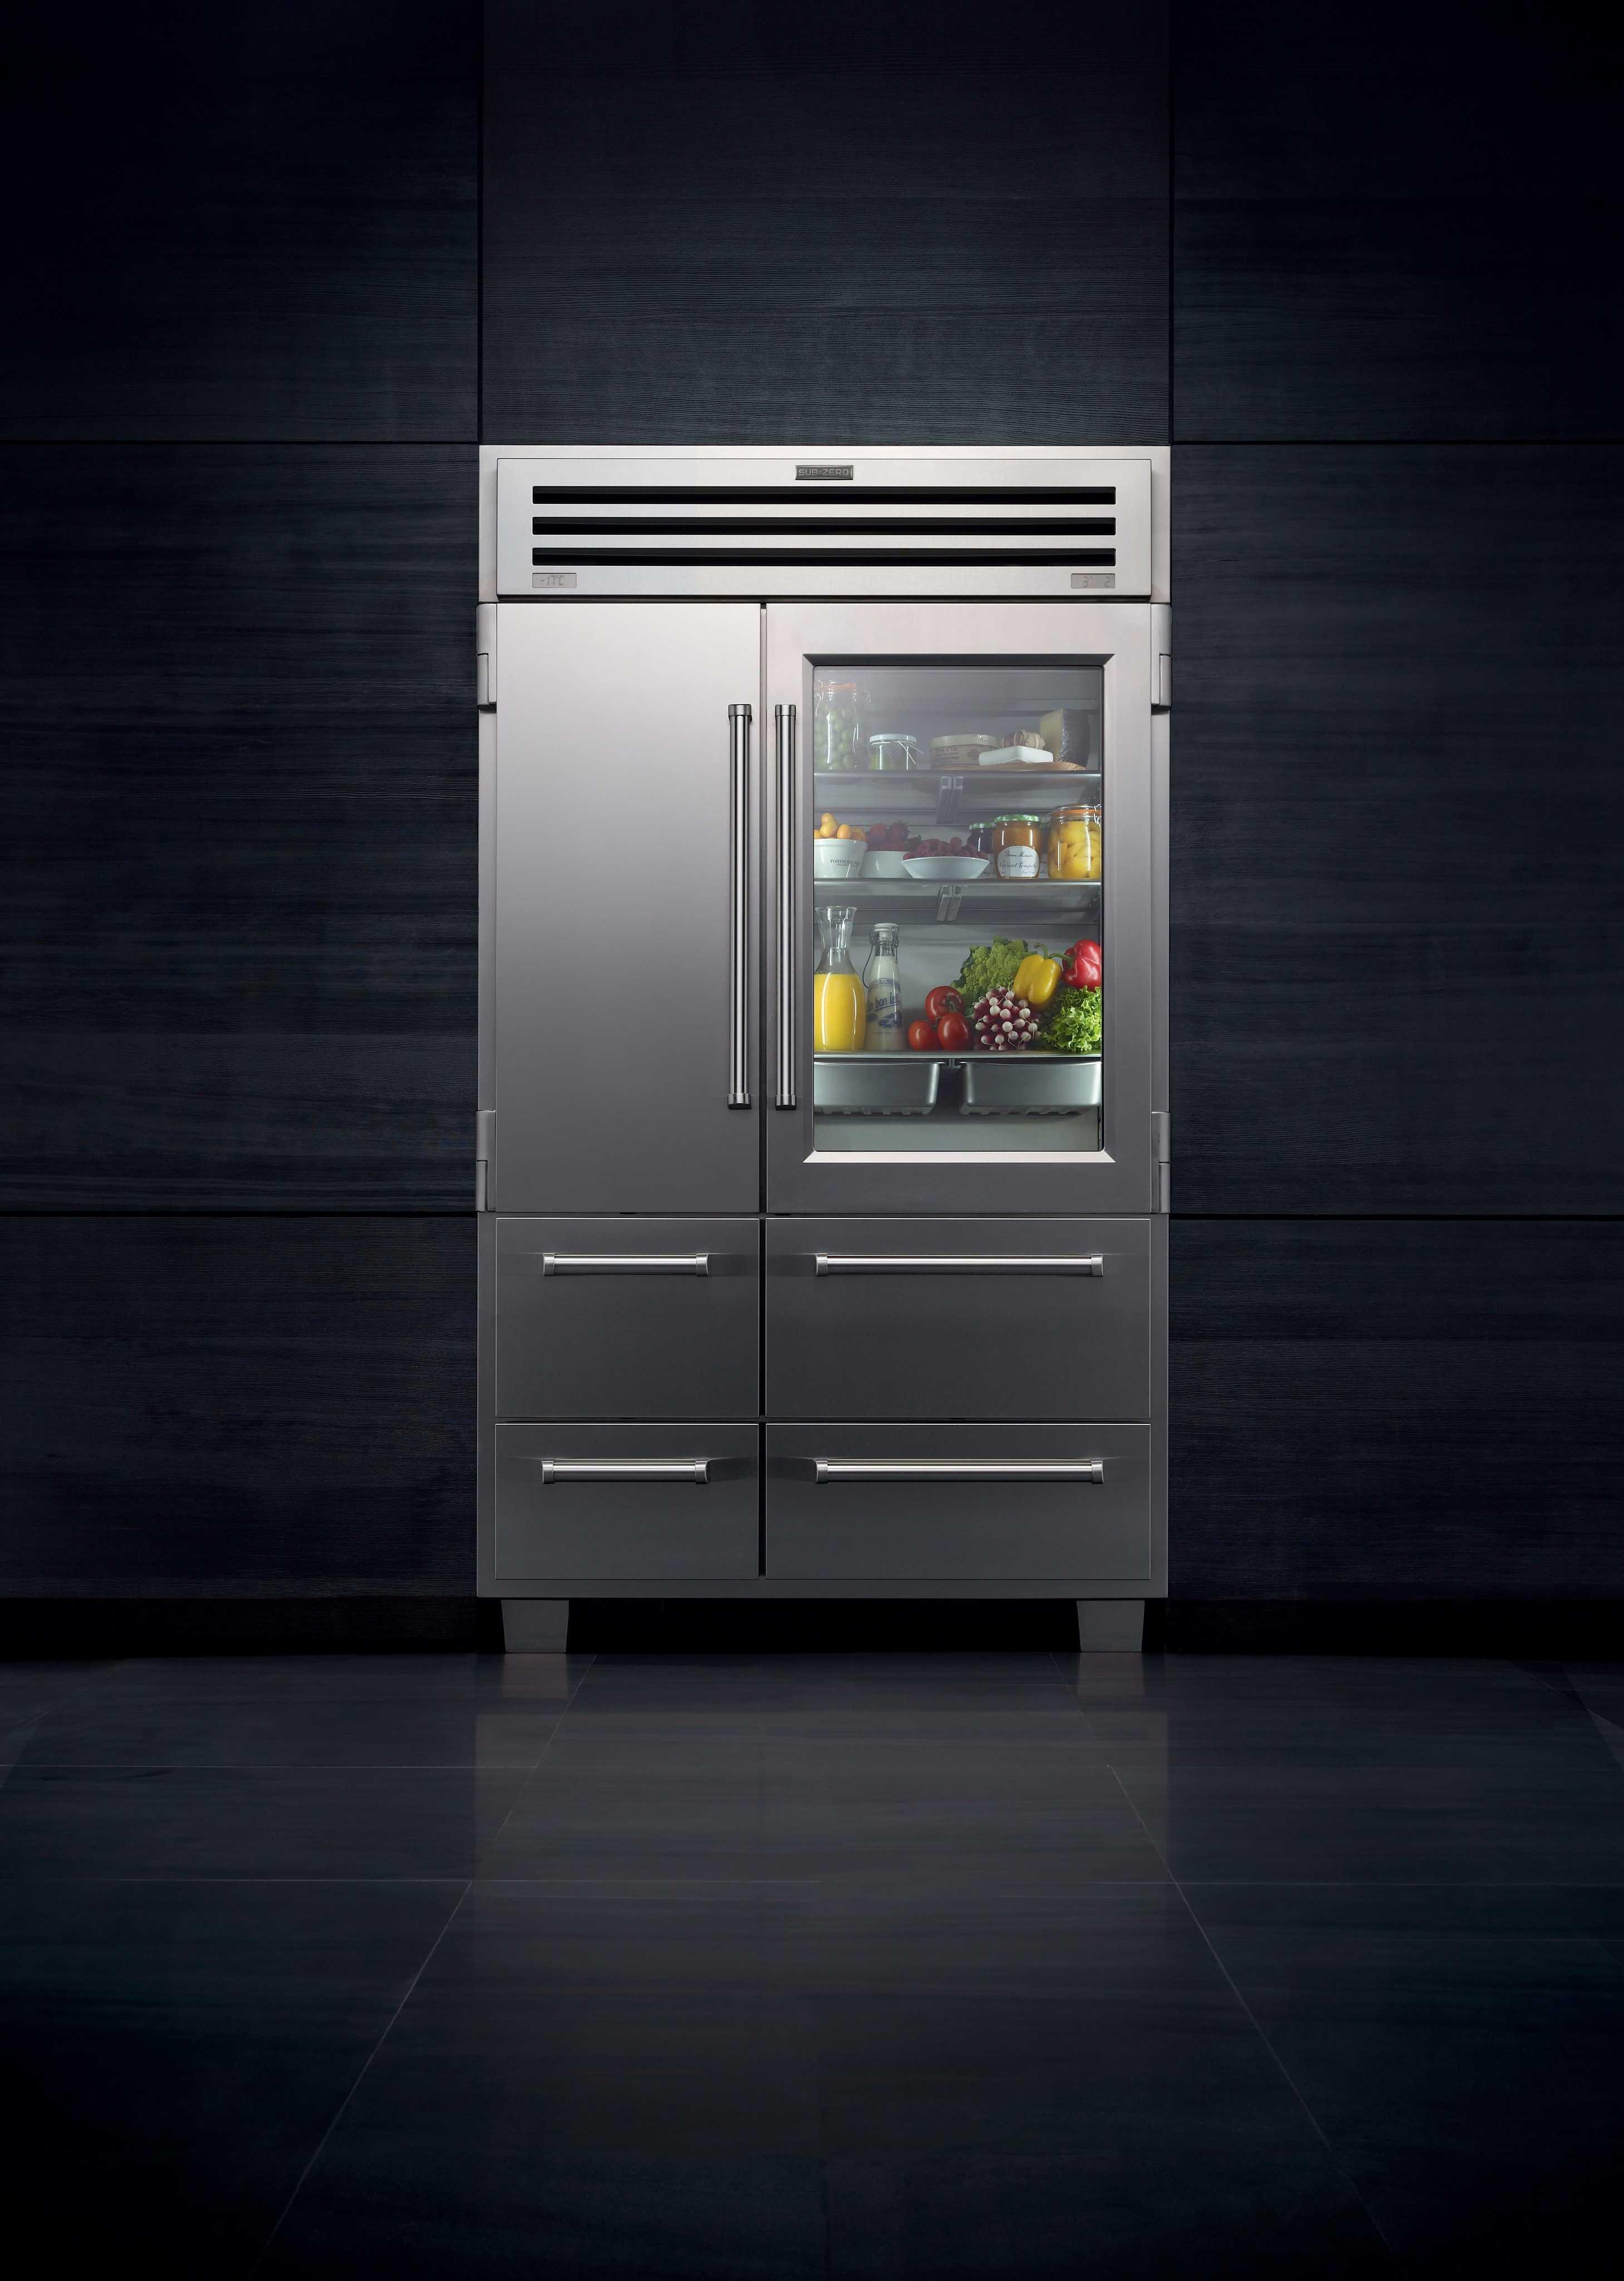 subzero pro 48 kühlgerät küche luxus kühlschrank